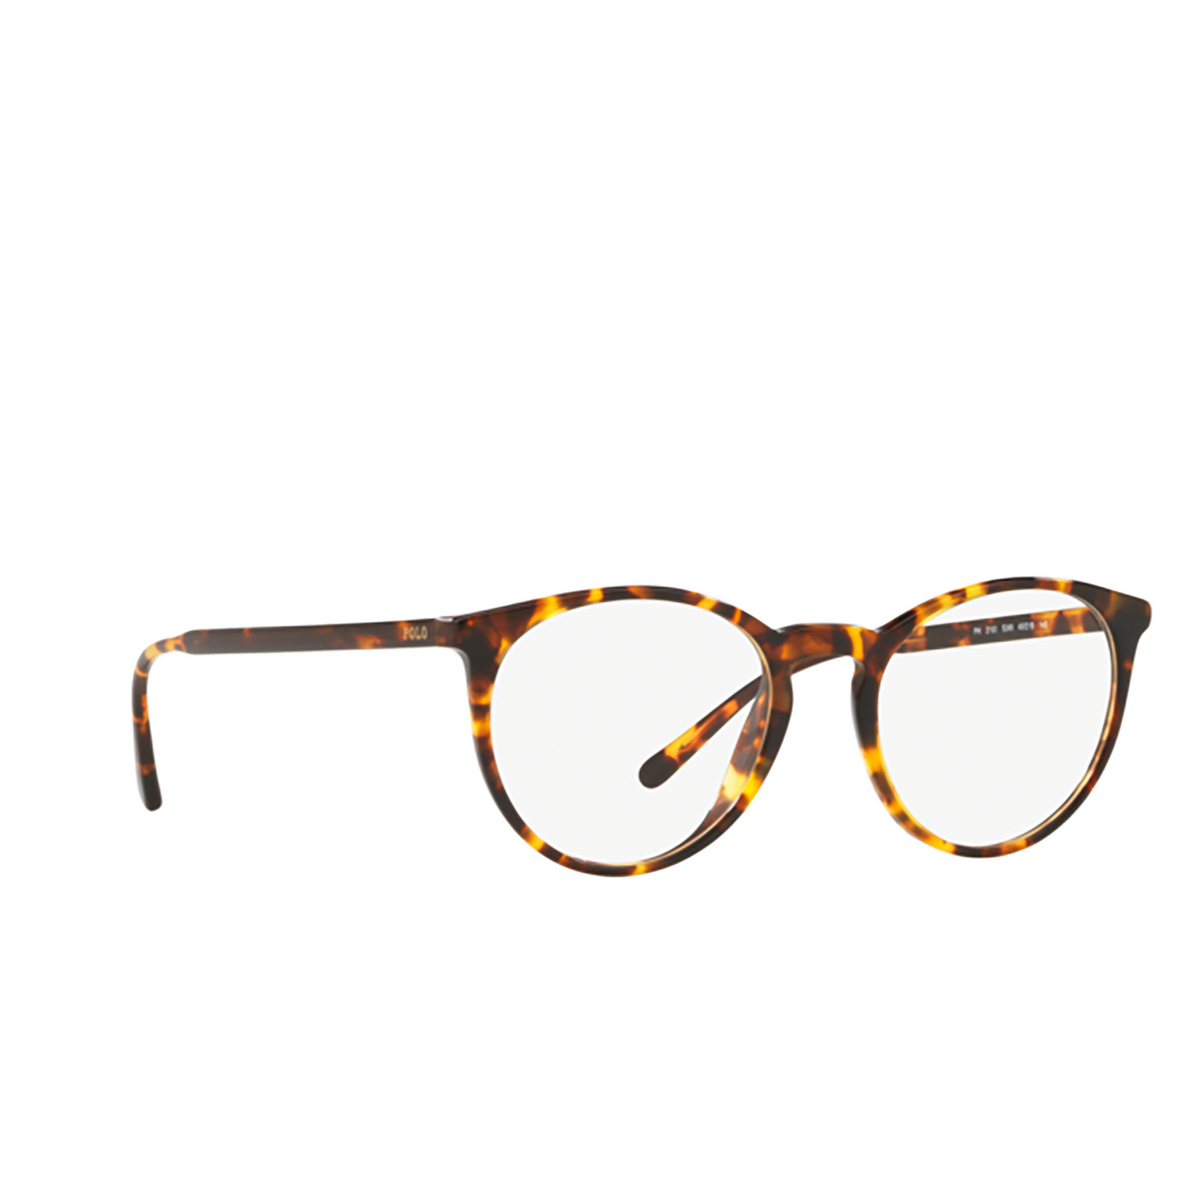 Polo Ralph Lauren® Round Eyeglasses: PH2193 color Shiny Antique Tortoise 5249.